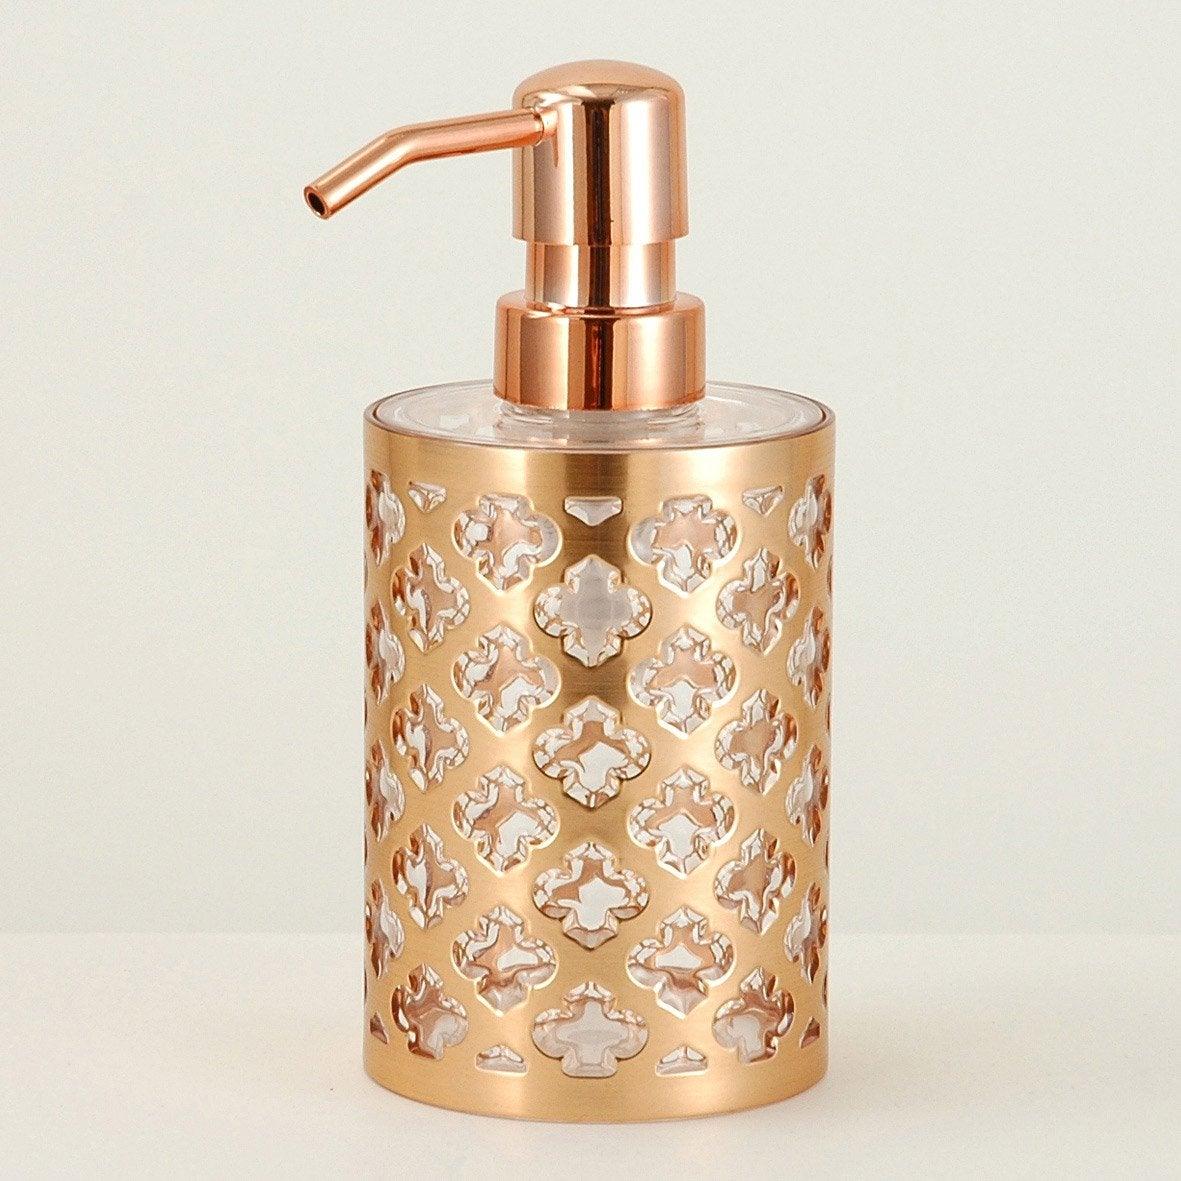 Distributeur de savon Jasmine, cuivre